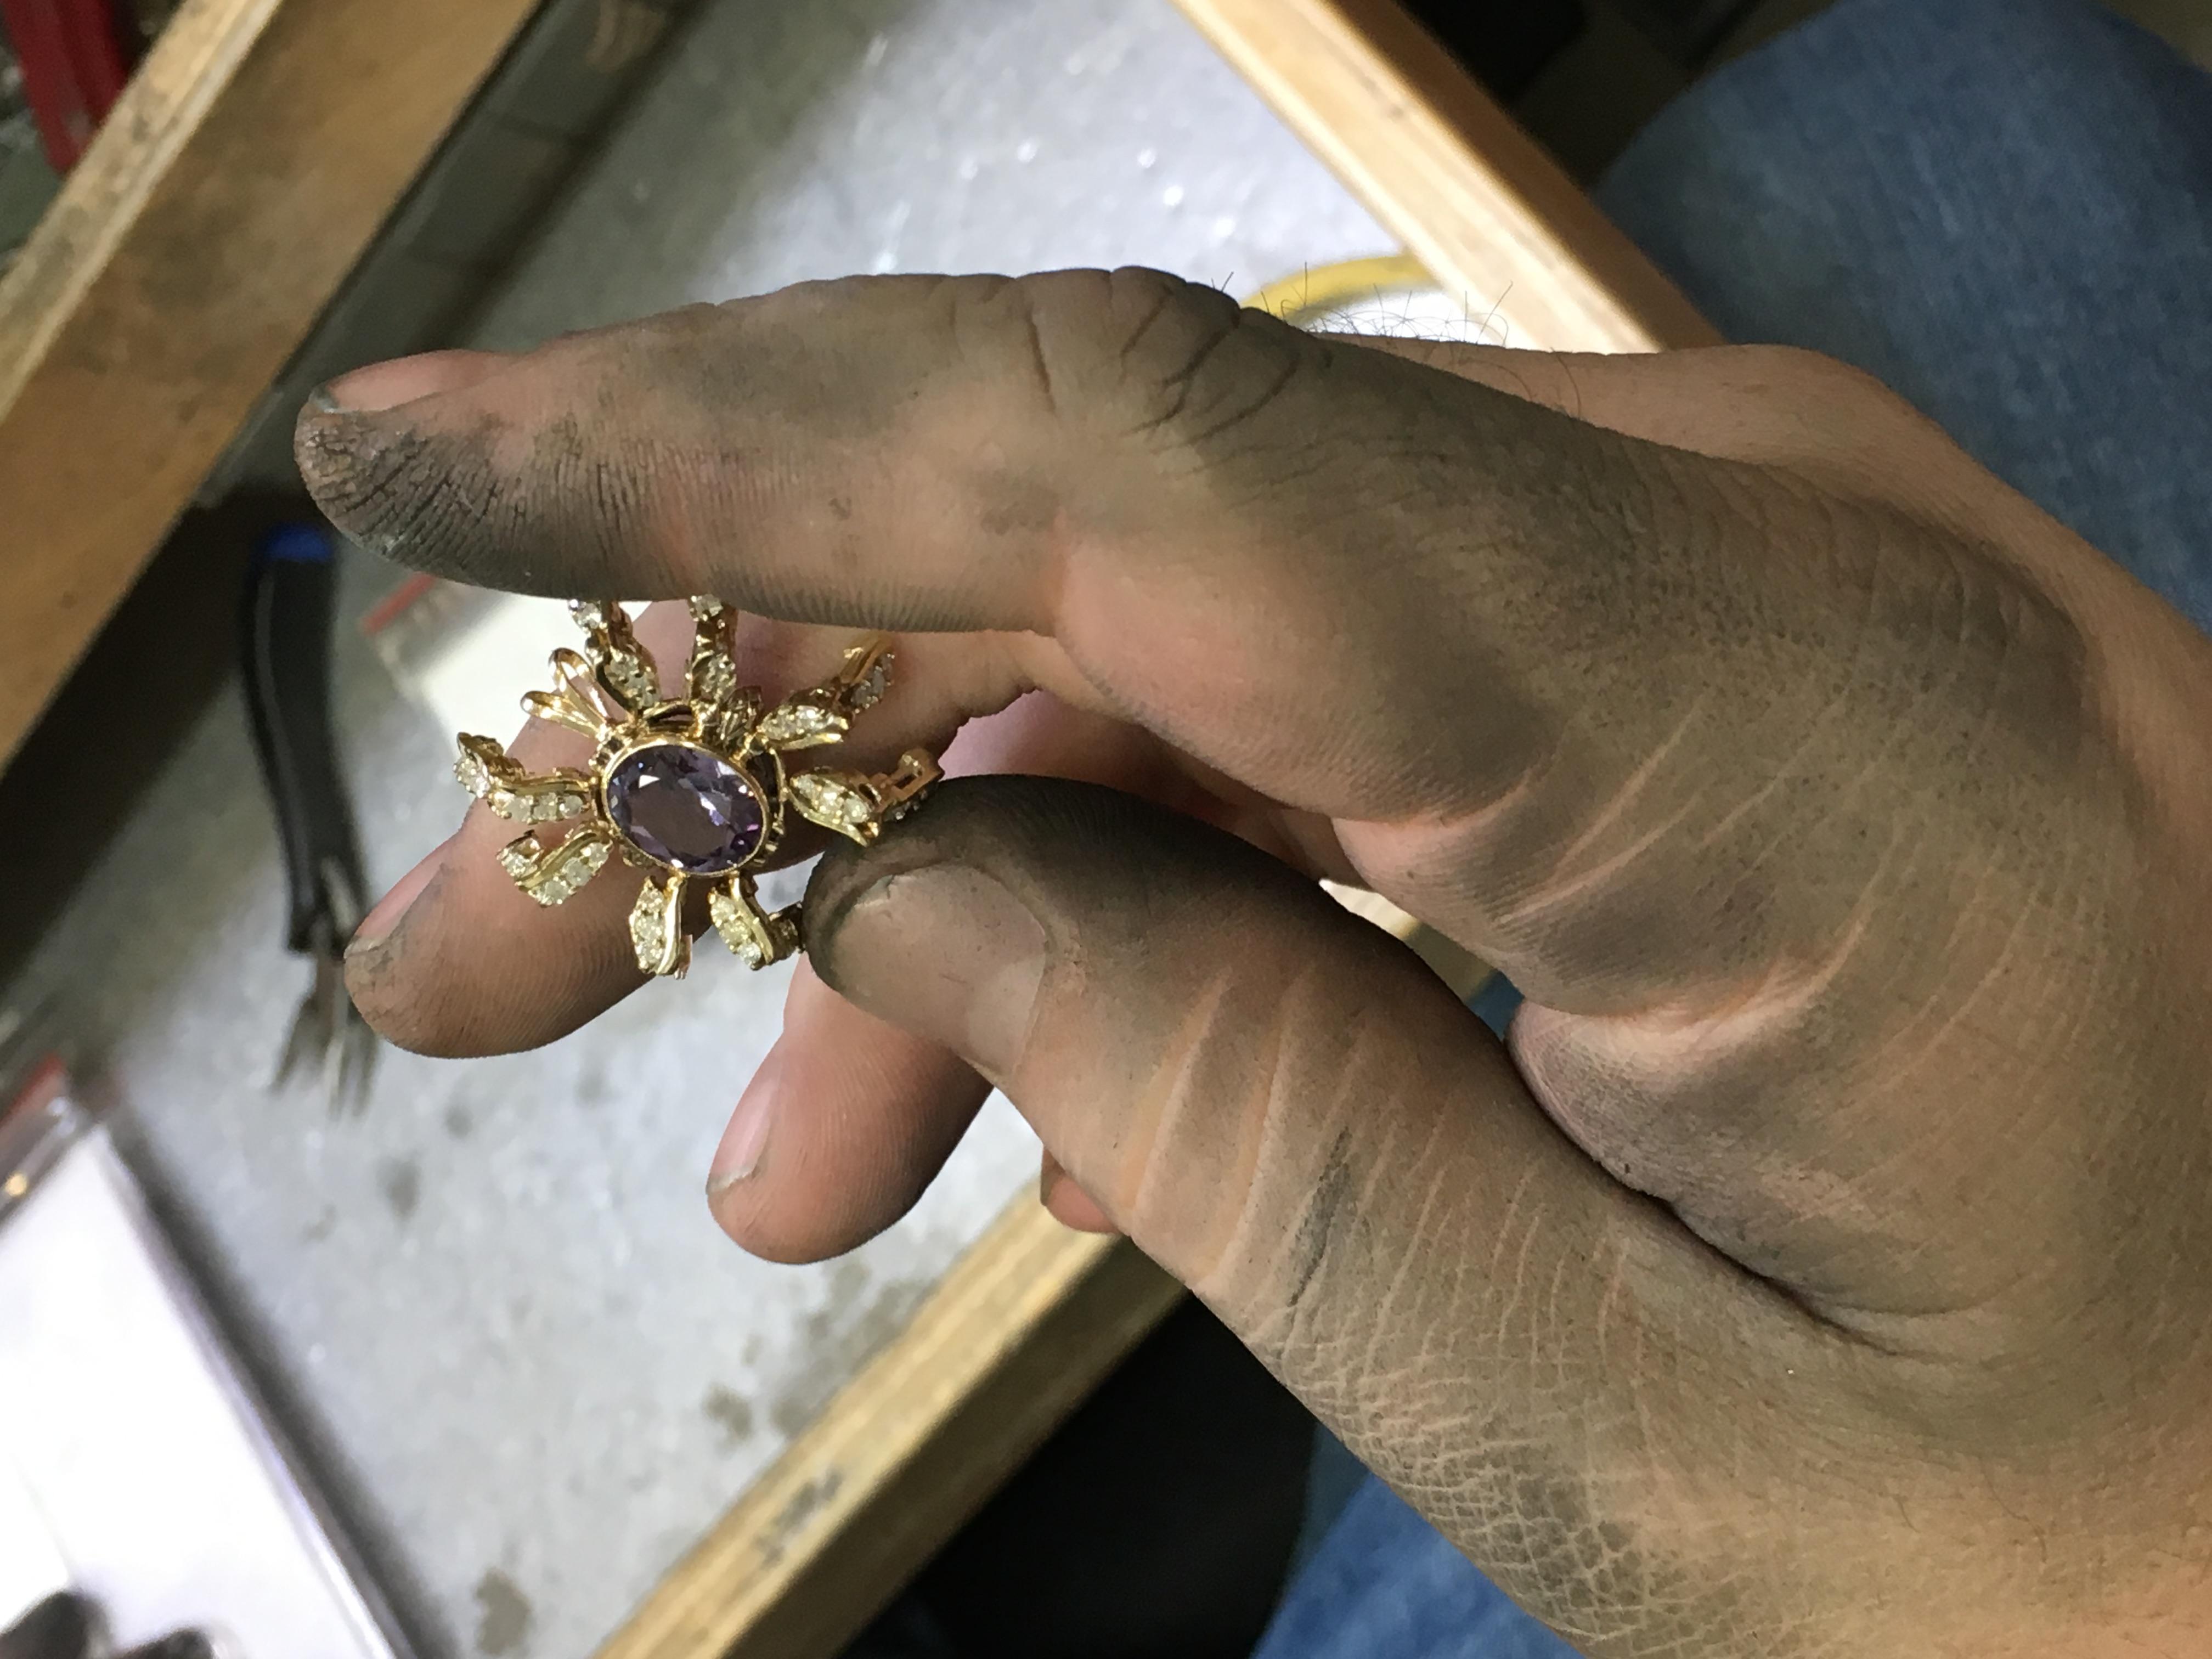 Al turned into a new pendant